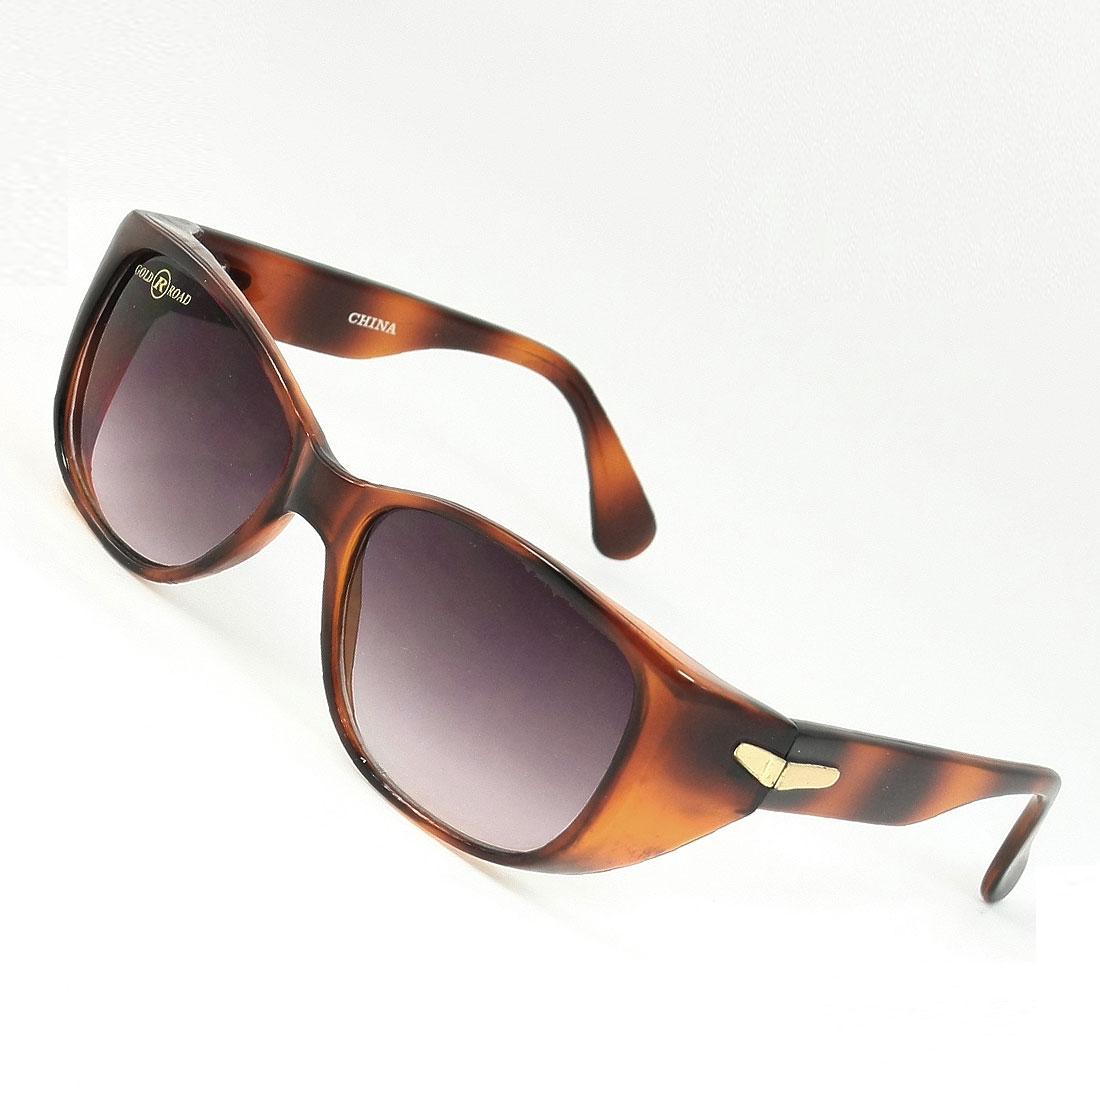 Woman Clear Gray Teardrop Lens Plastic Full Rim Frame Sunglasses Glasses